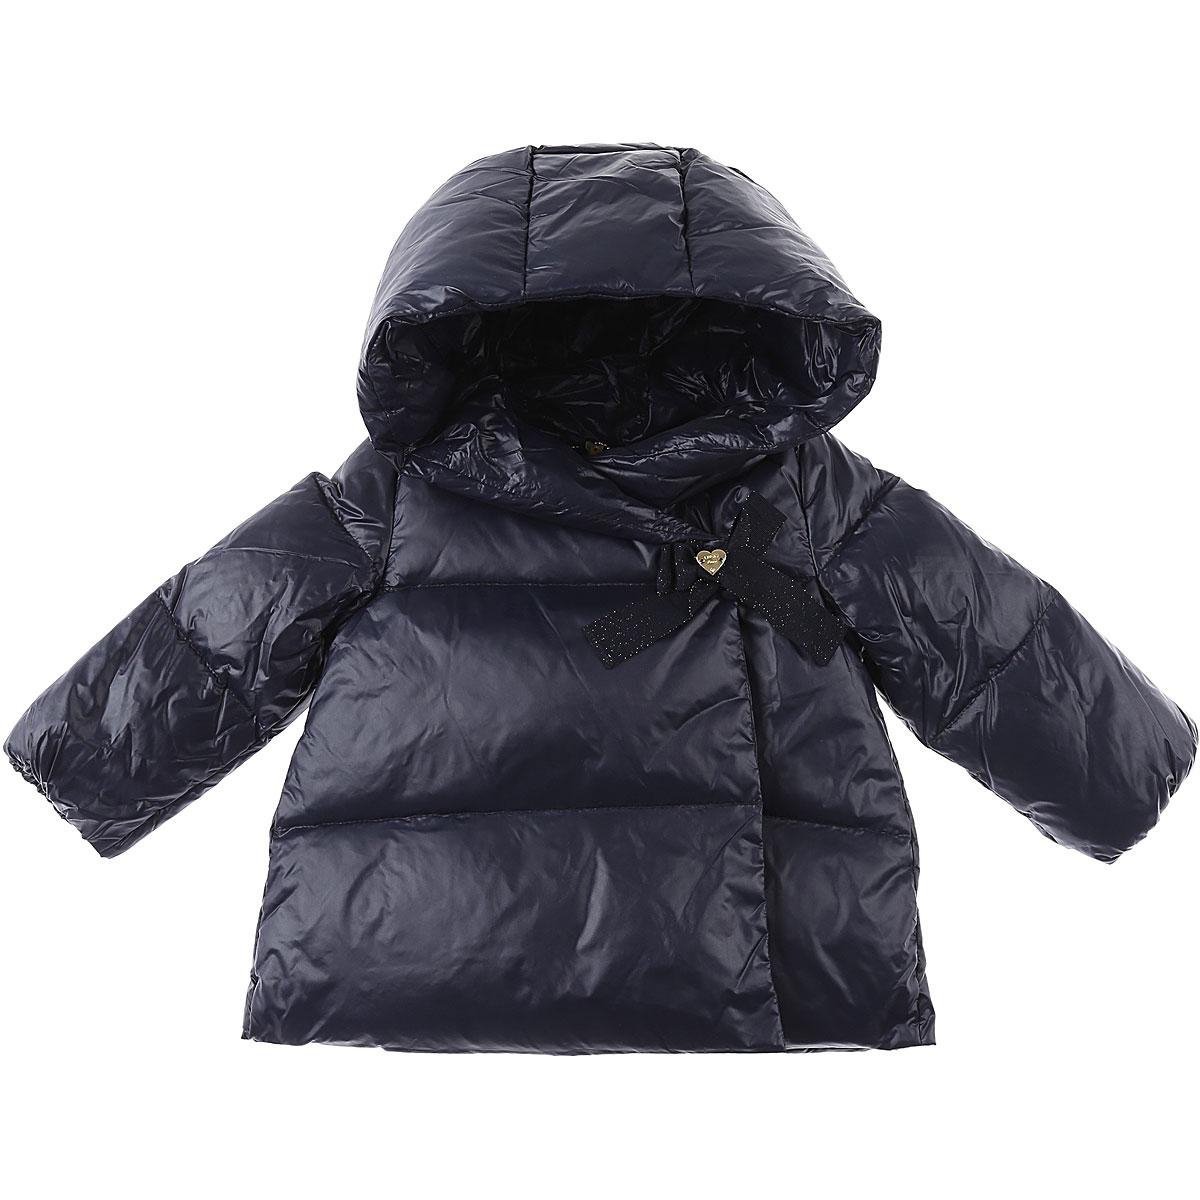 Liu Jo Baby Down Jacket for Girls On Sale, Midnight, polyamide, 2019, 12M 18M 9M